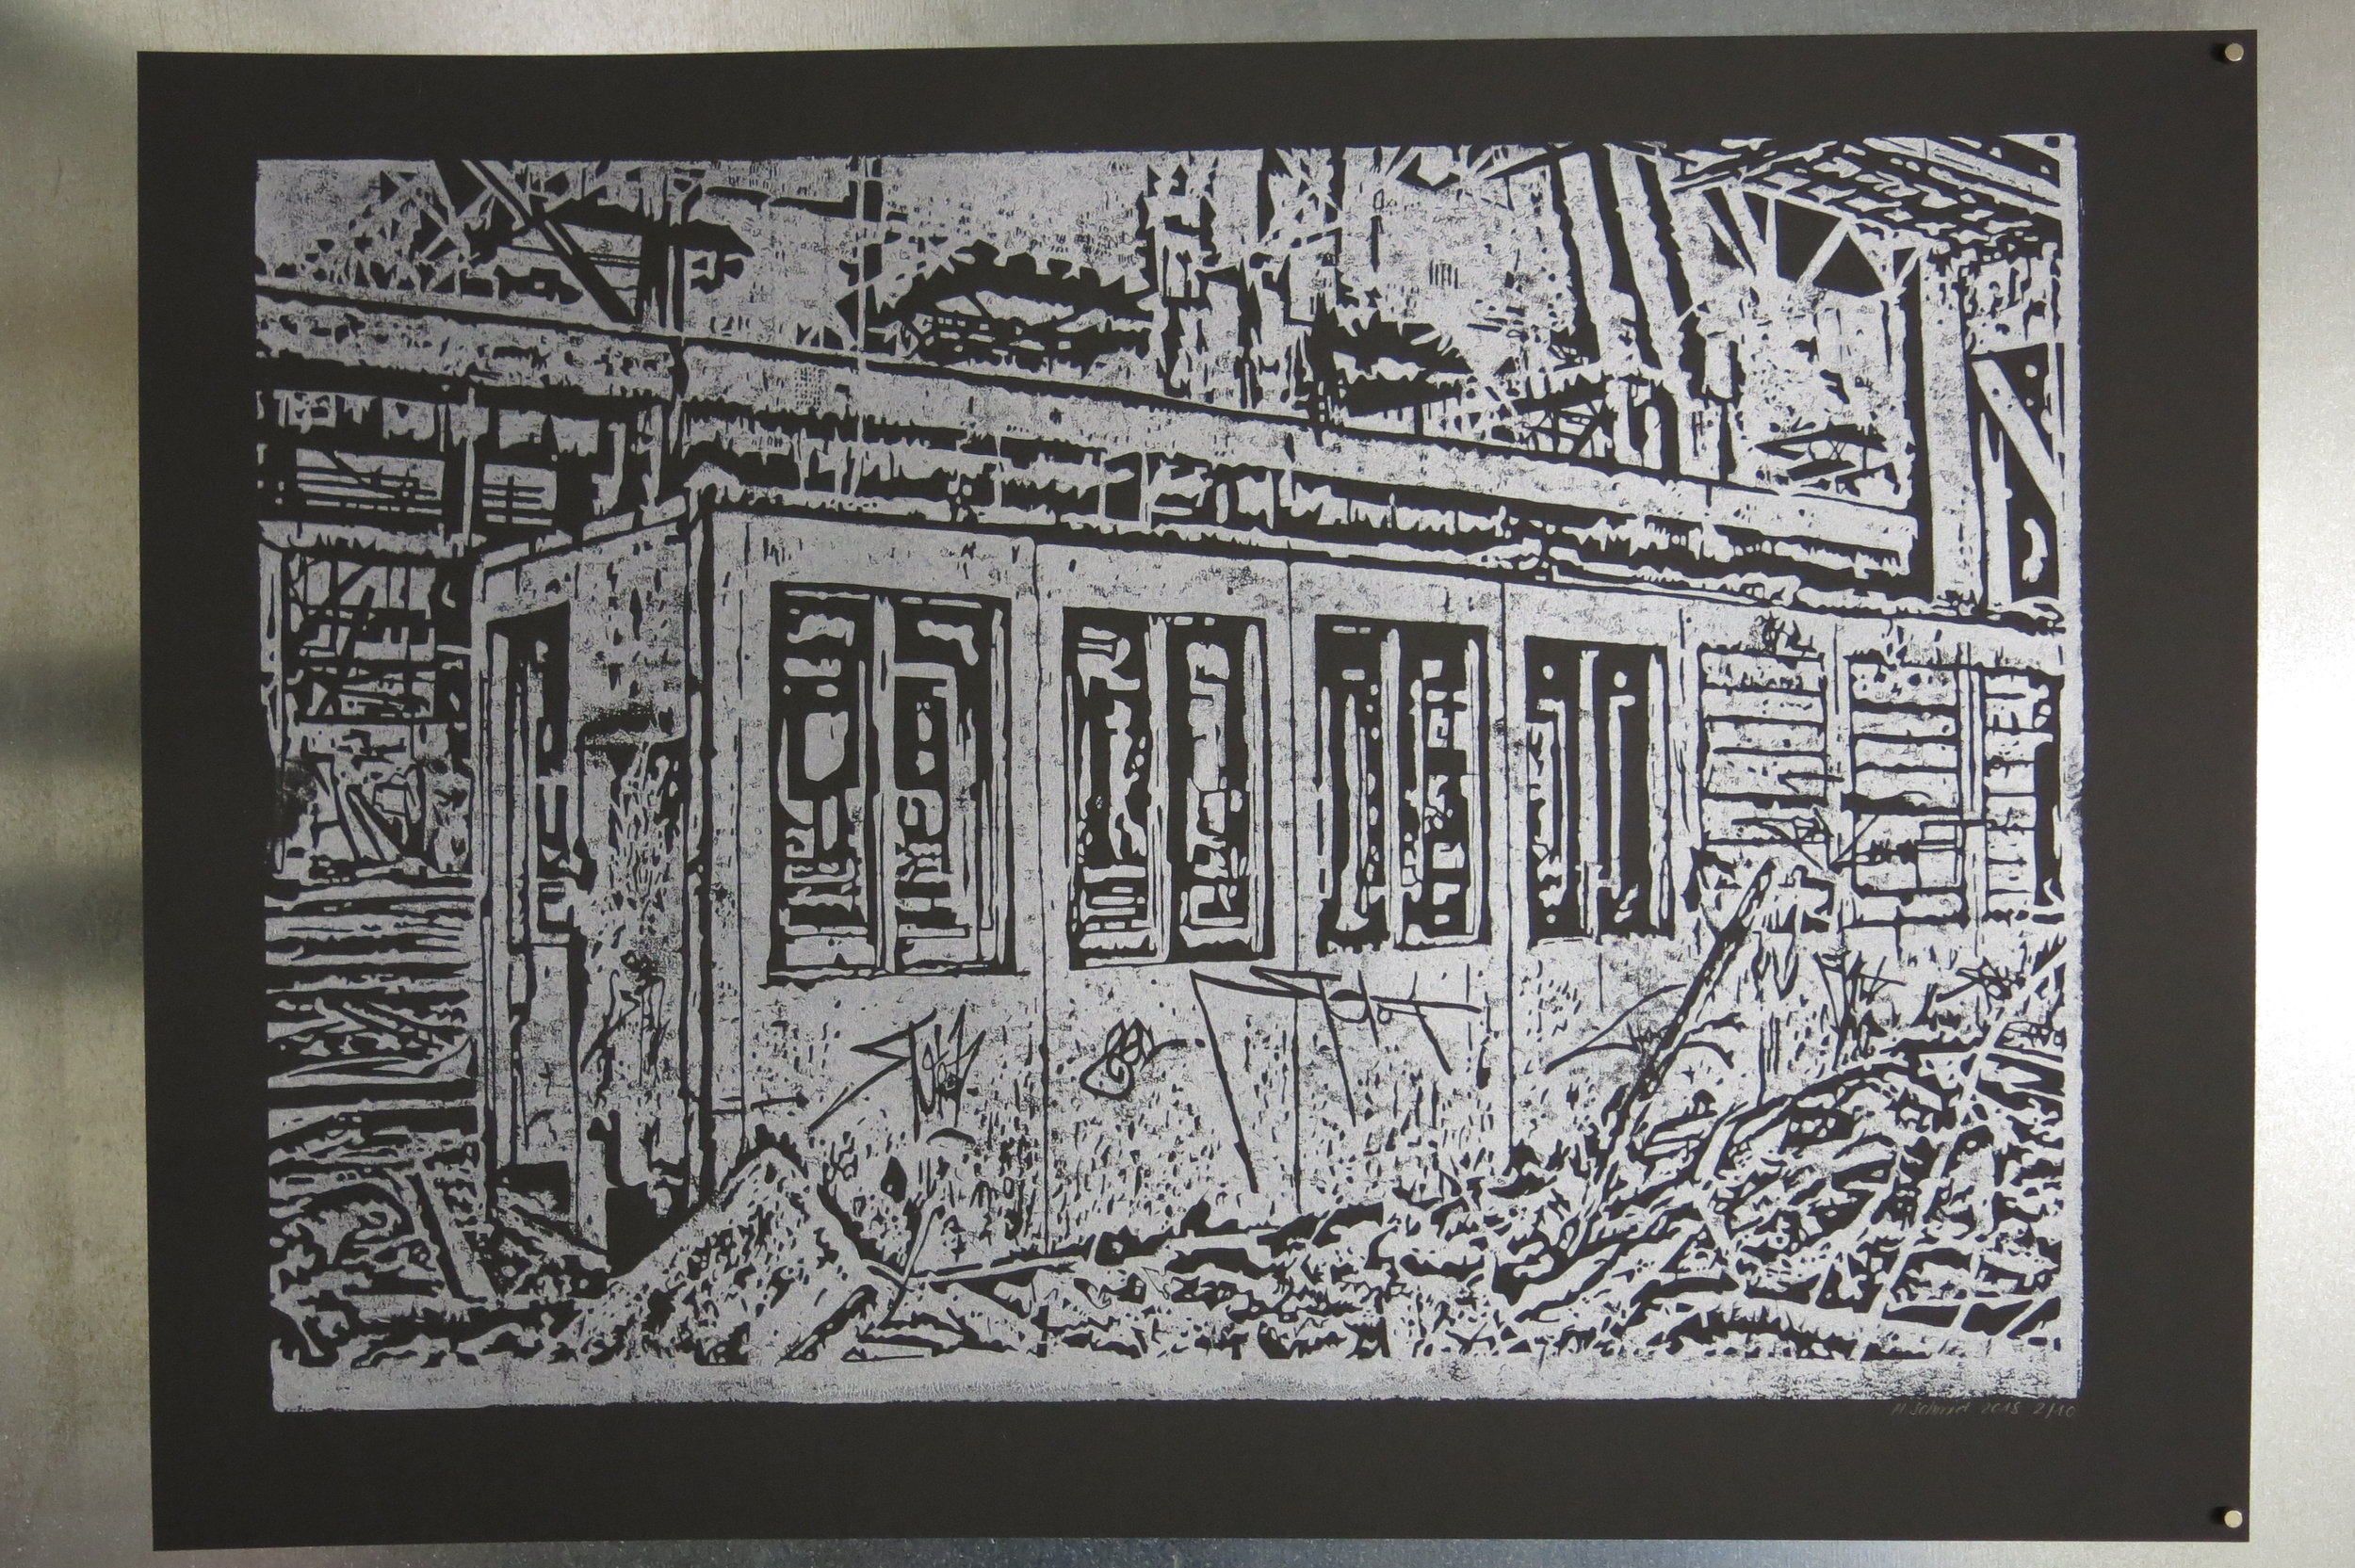 Linocut, 50cm x 70cm, 2018, Edition 1/10